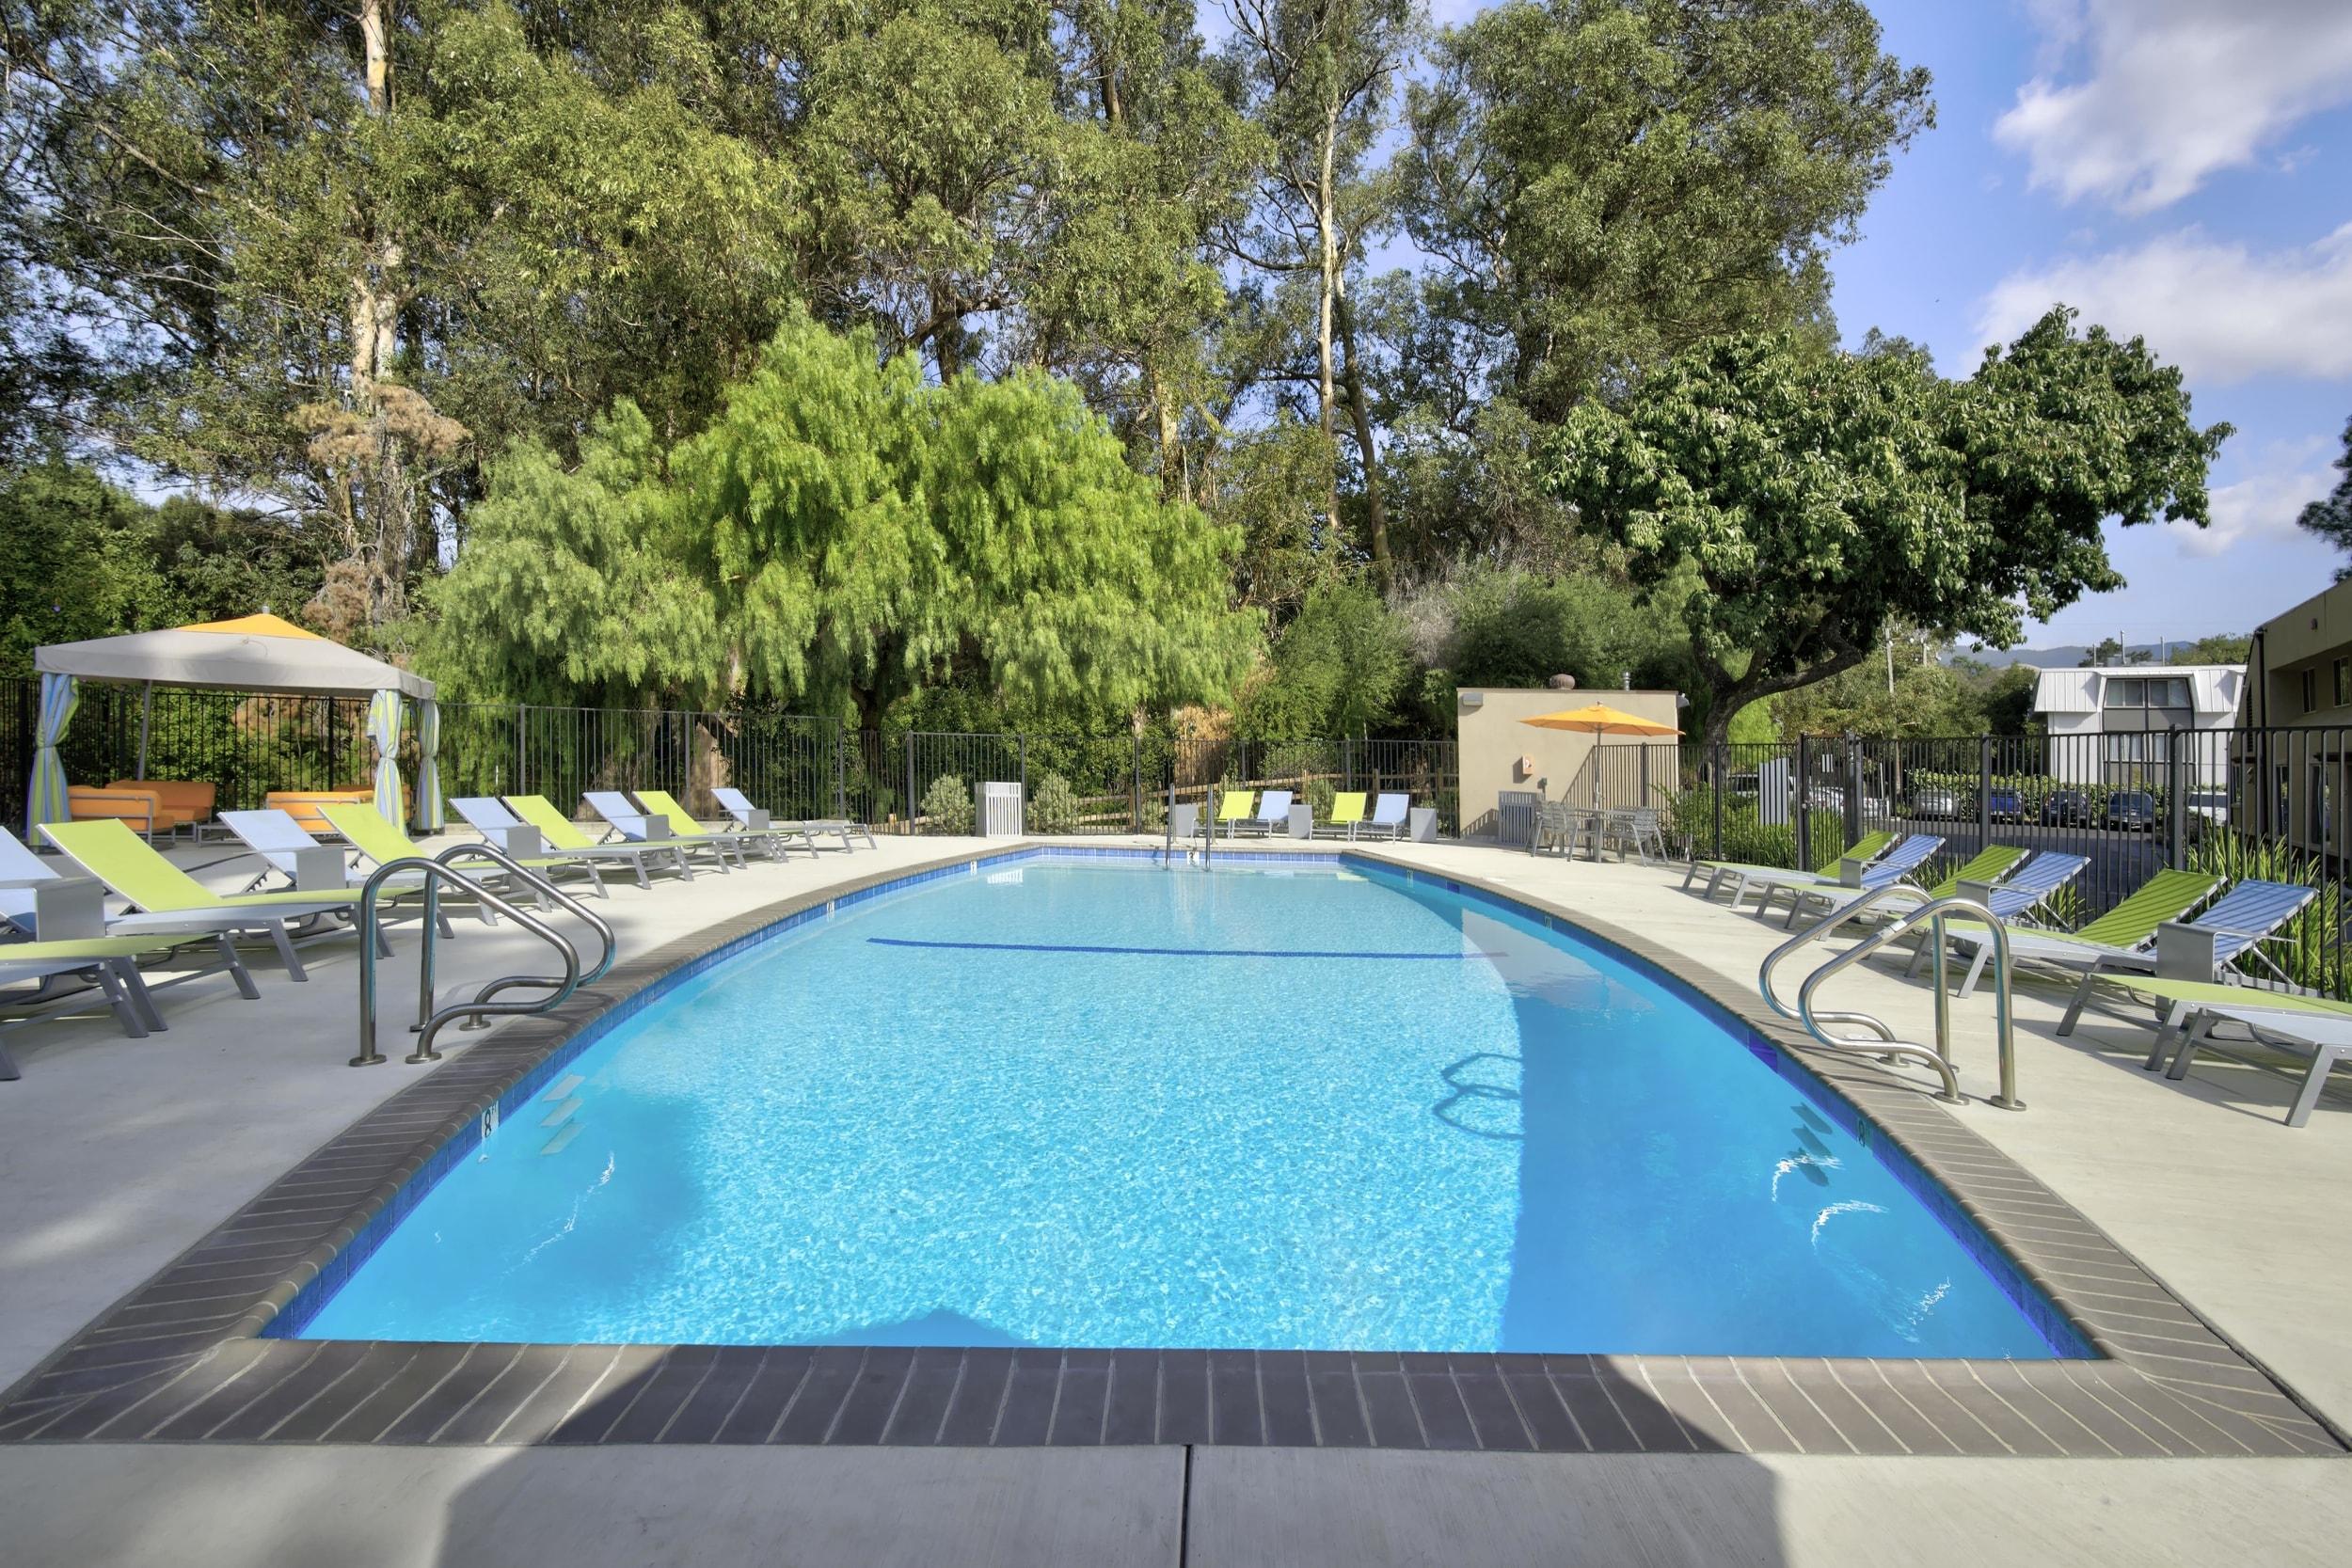 Mustang Village Apartments-Sample Image of San Luis Obispo CA Nurse Rental